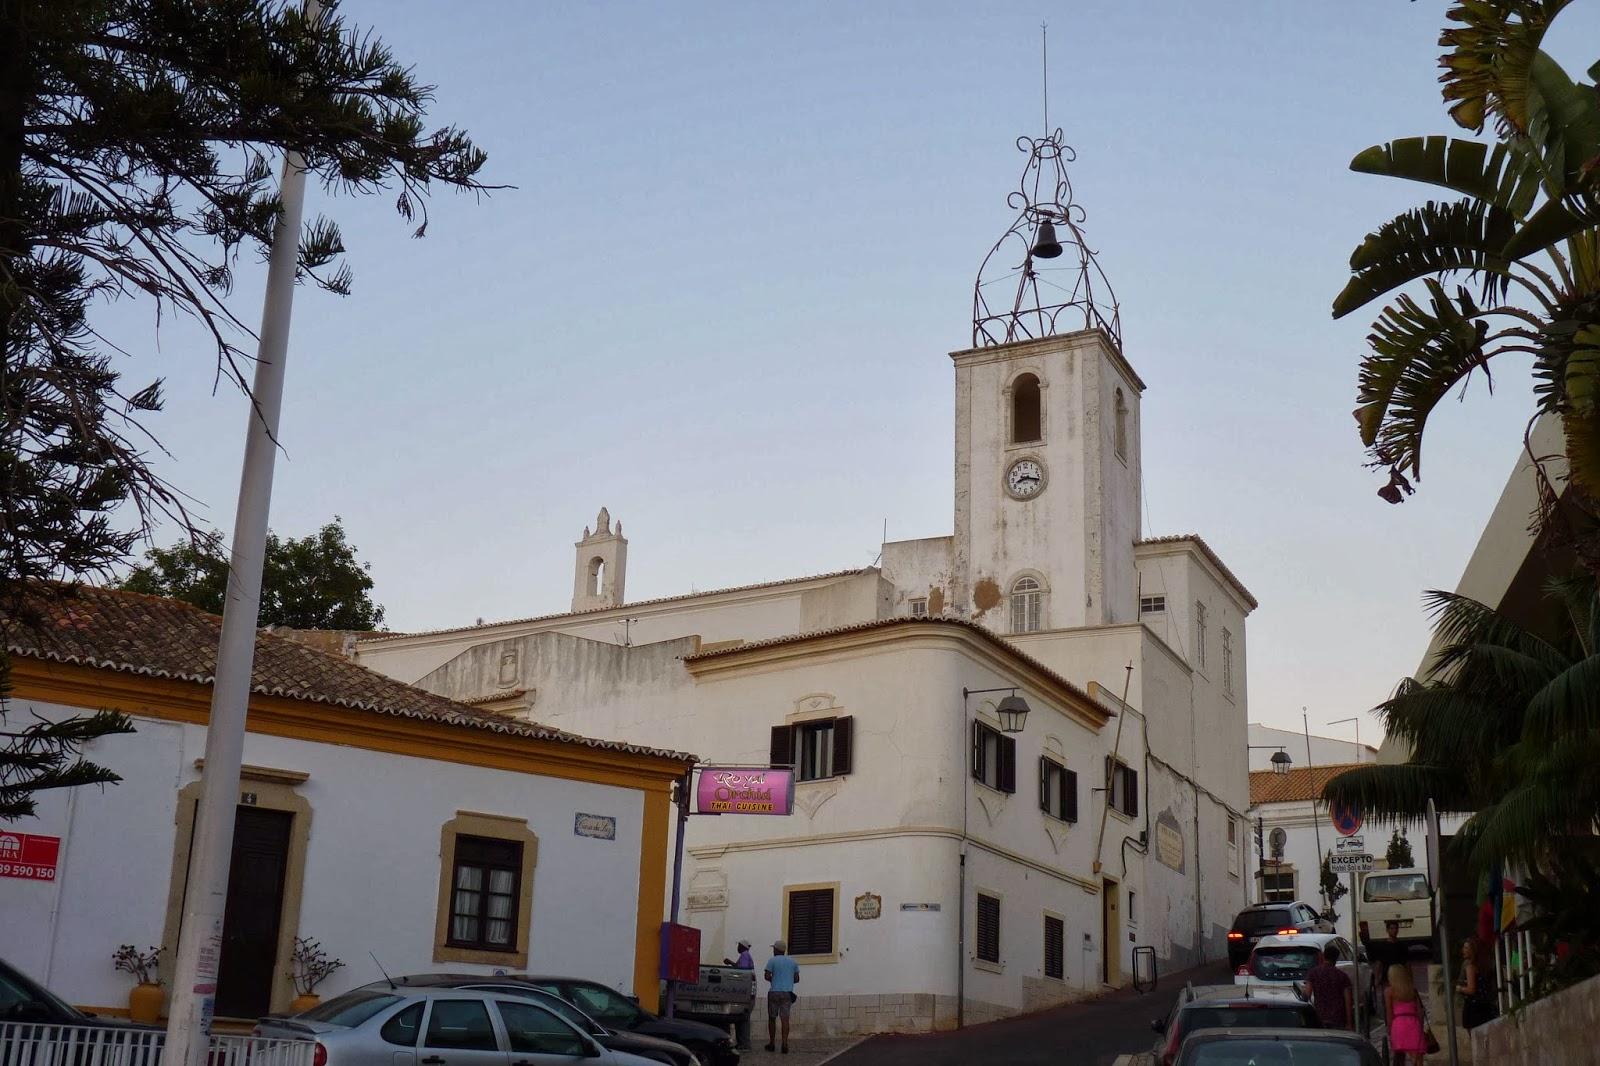 La Torre do Relógio o Torre del Reloj. Albufeira.